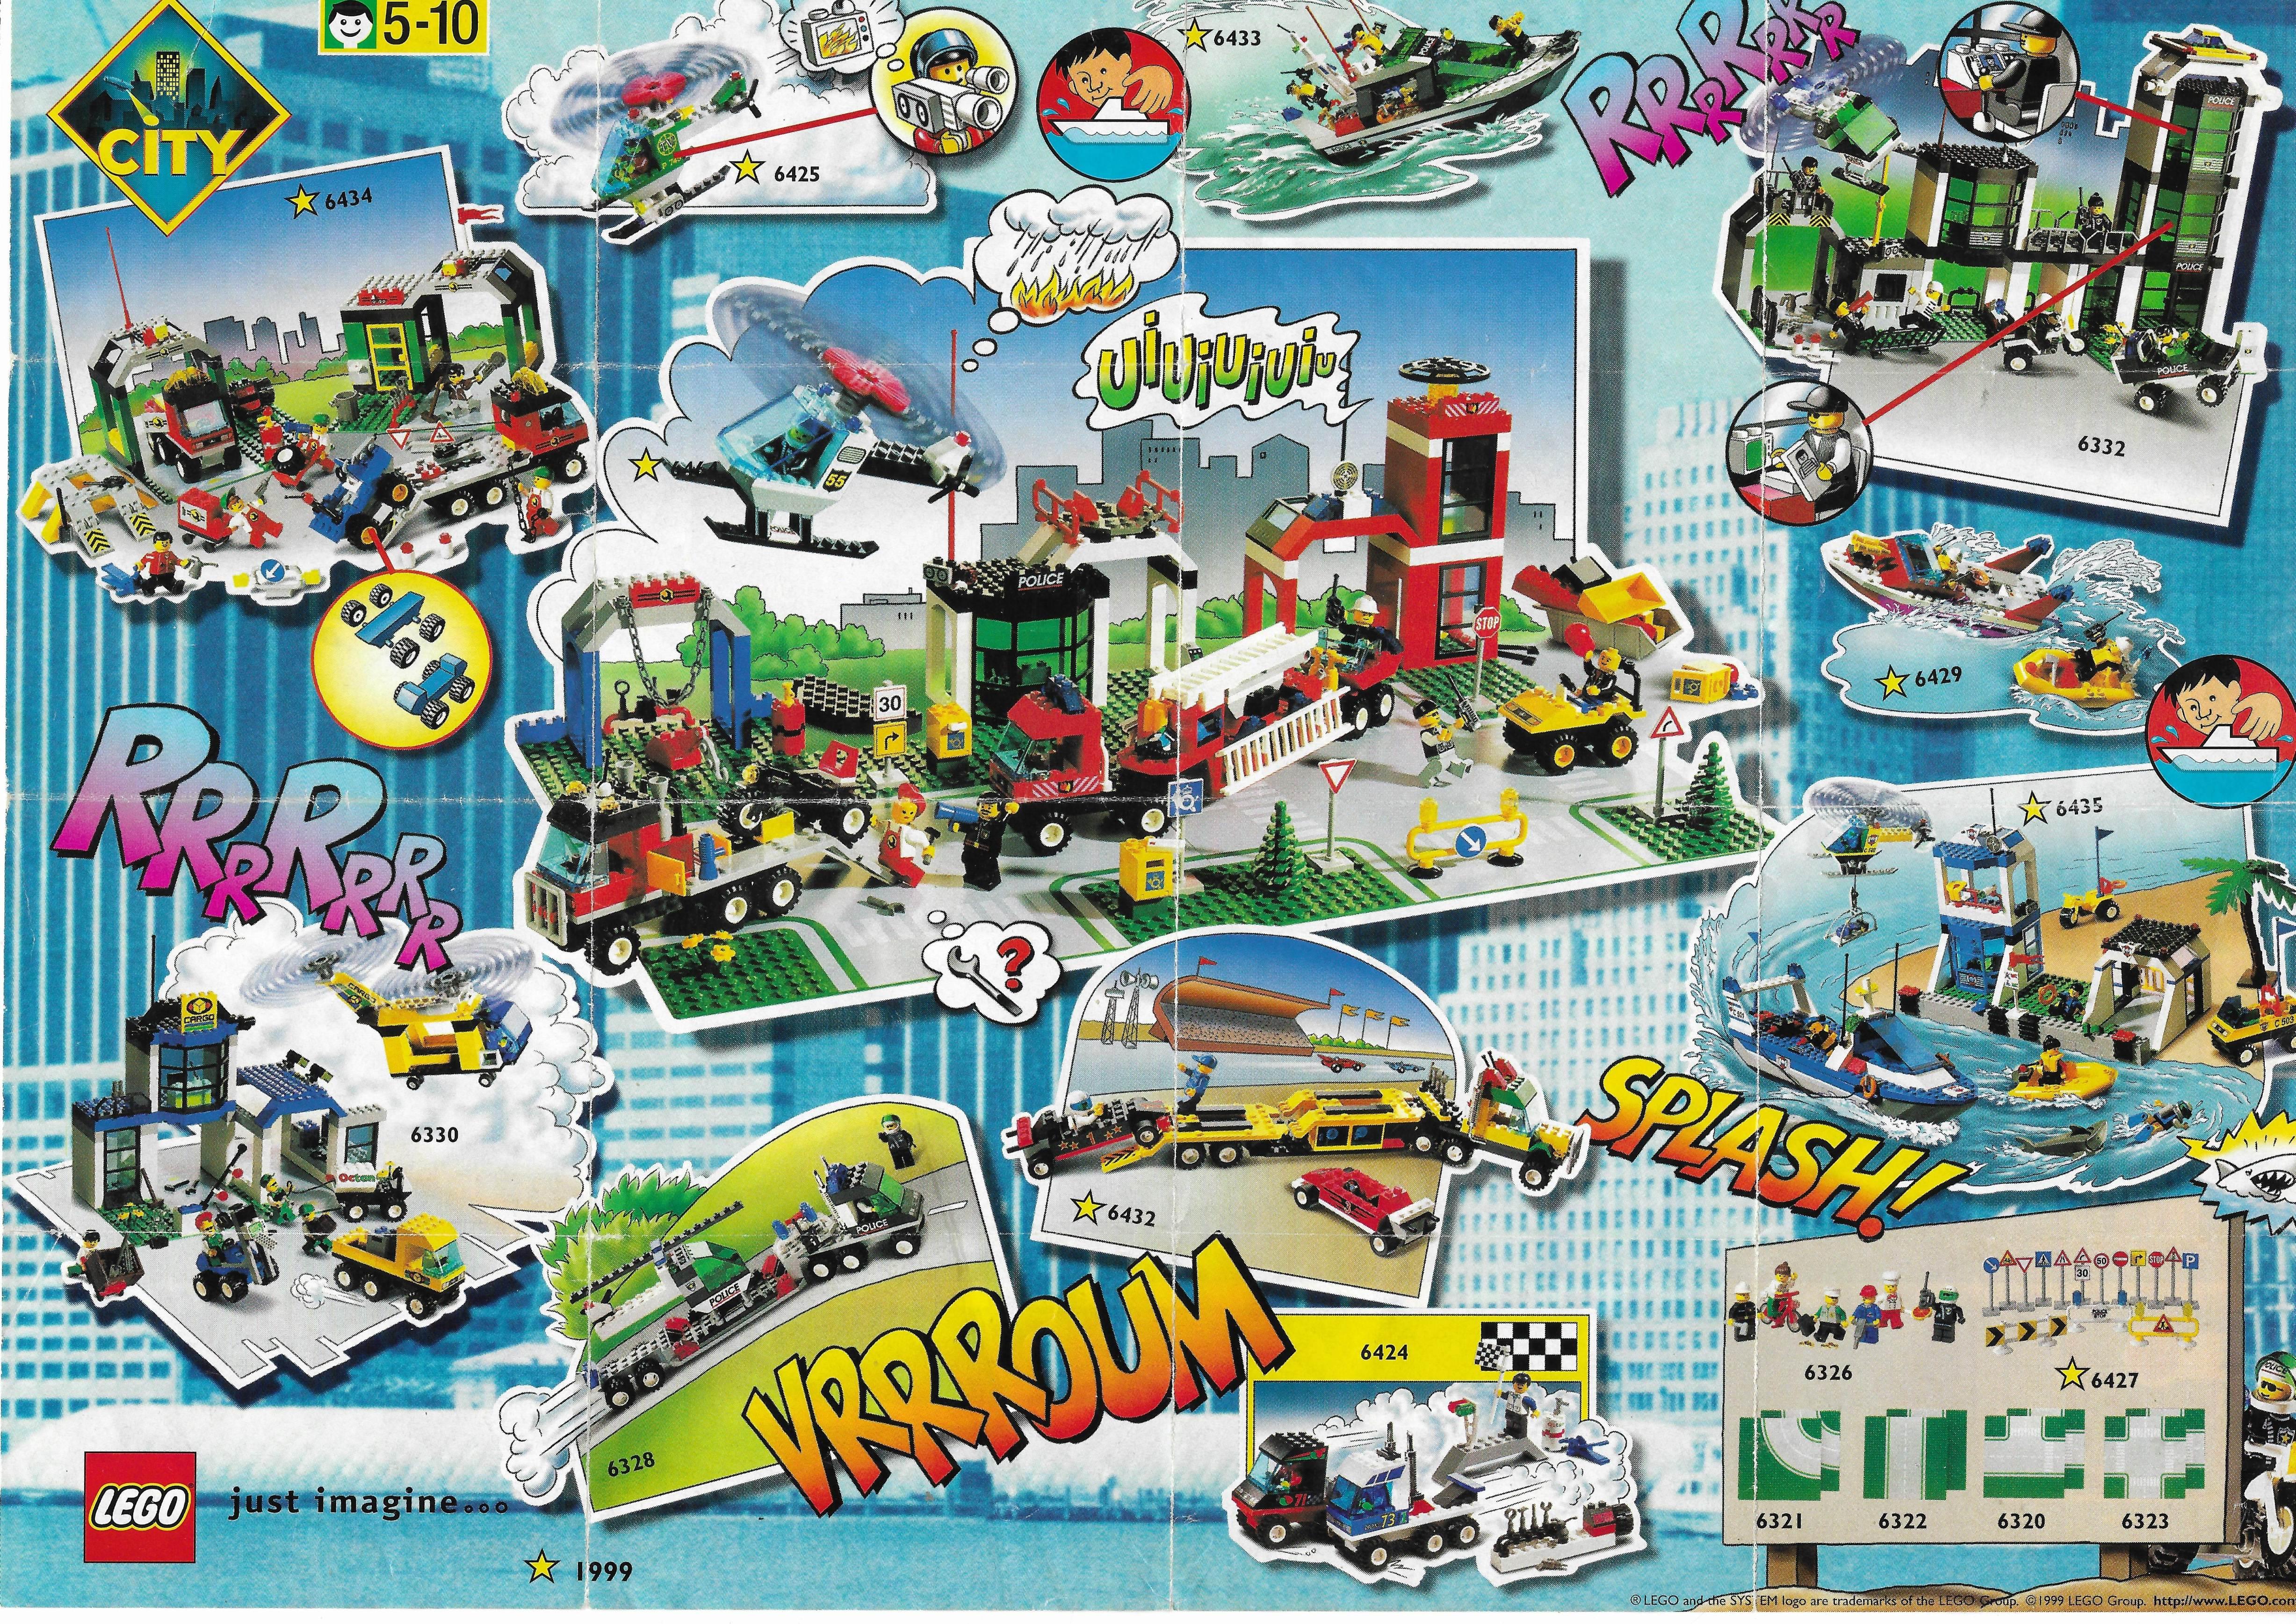 1999-es Lego City insert